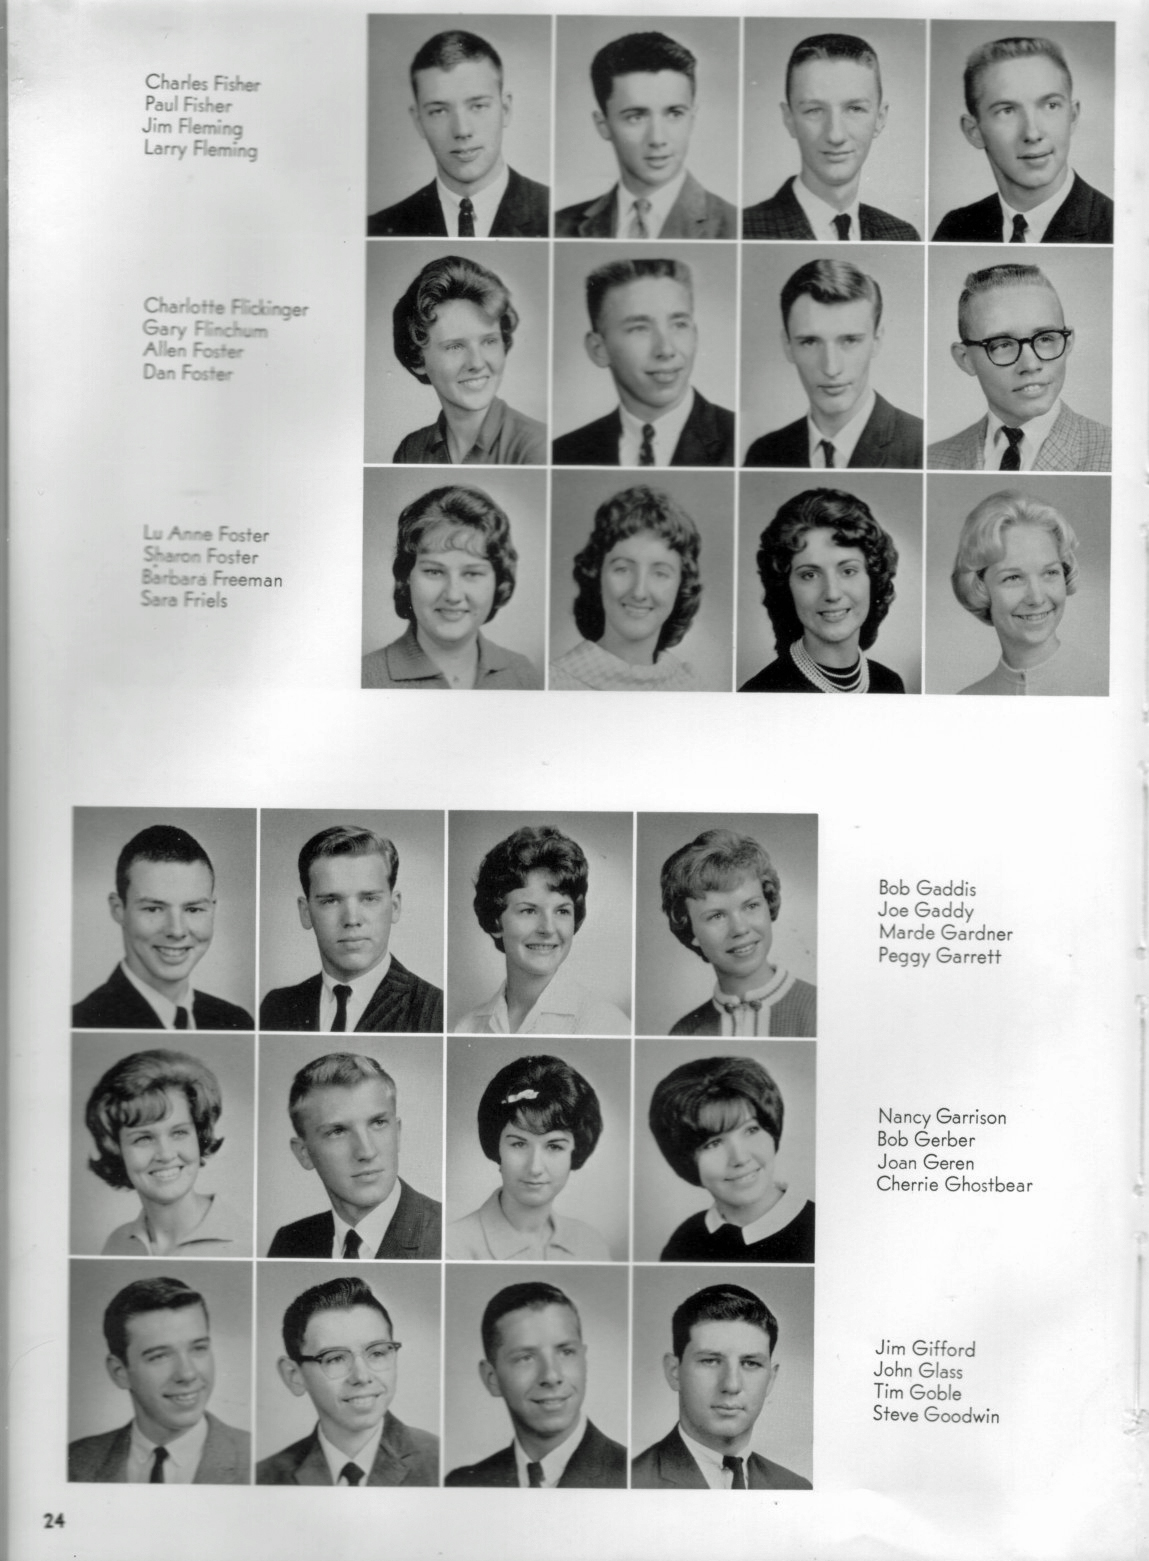 63-24C